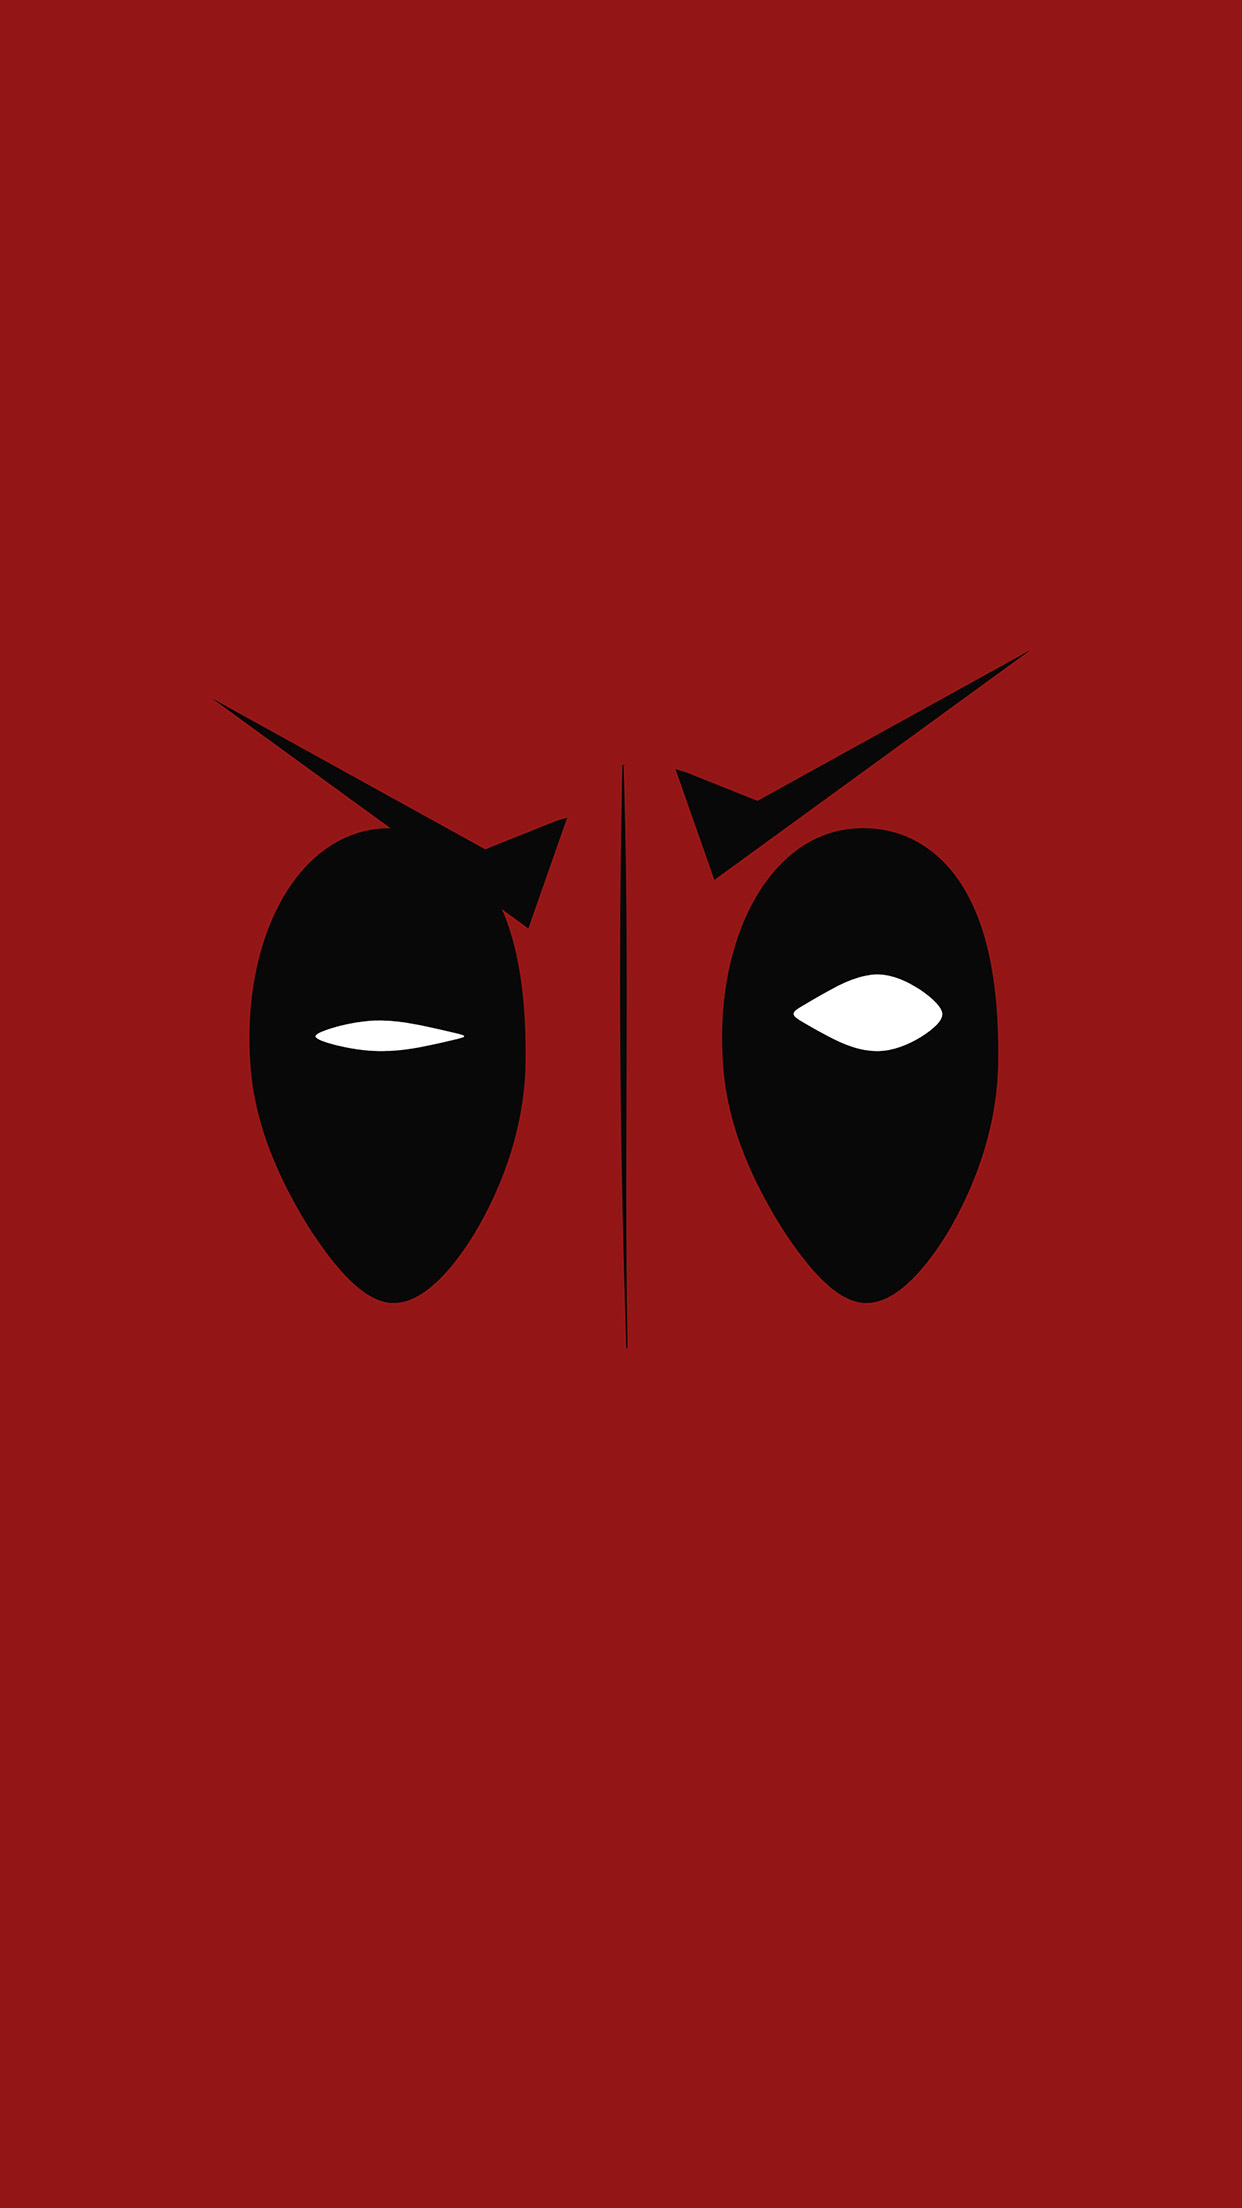 Iphone6papers Co Iphone 6 Wallpaper Ap59 Deadpool Hero Eye Logo